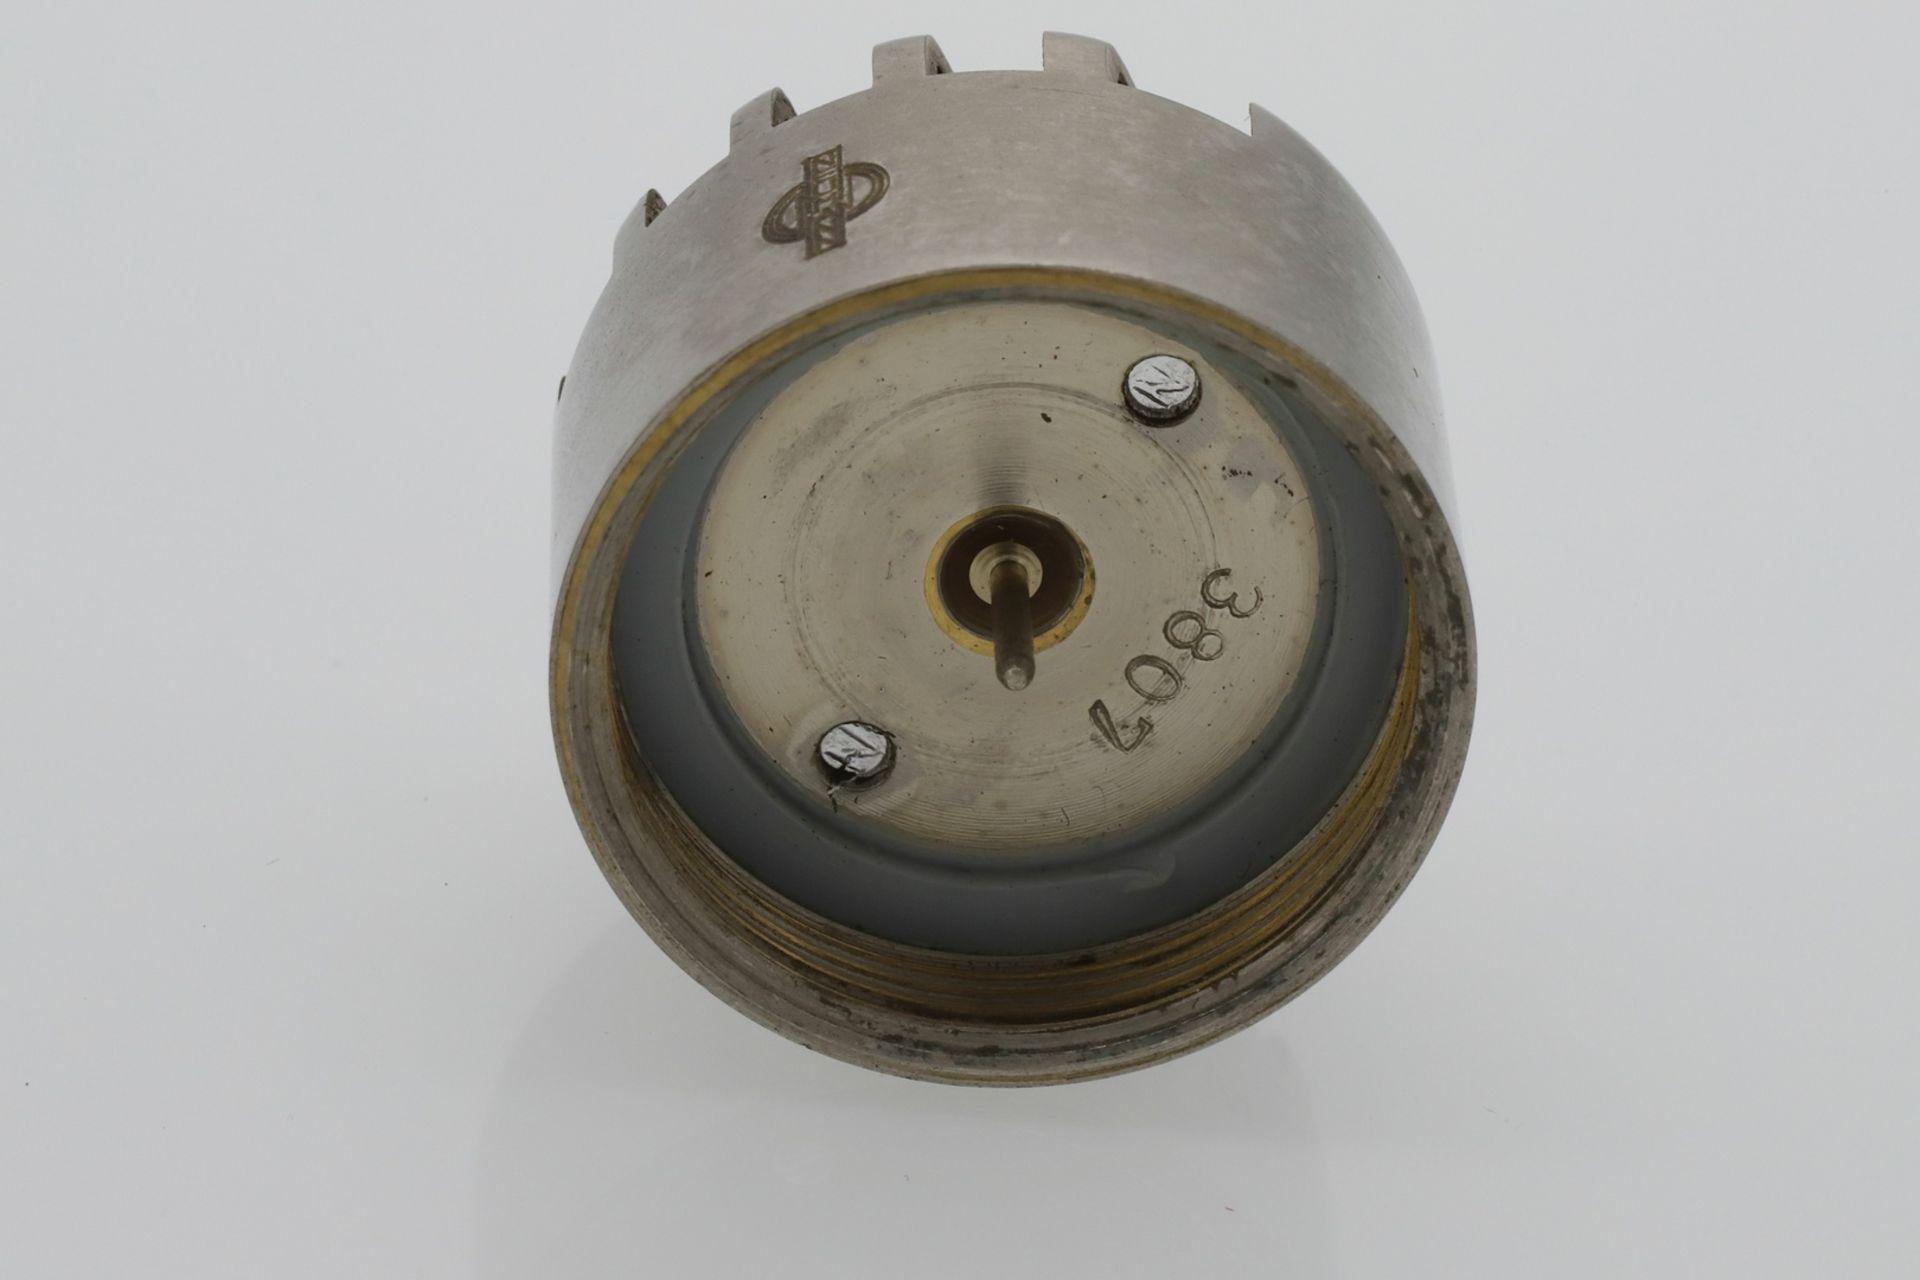 Neumann Kondensatormikrofonkapsel M58, um 1960 - Bild 4 aus 5